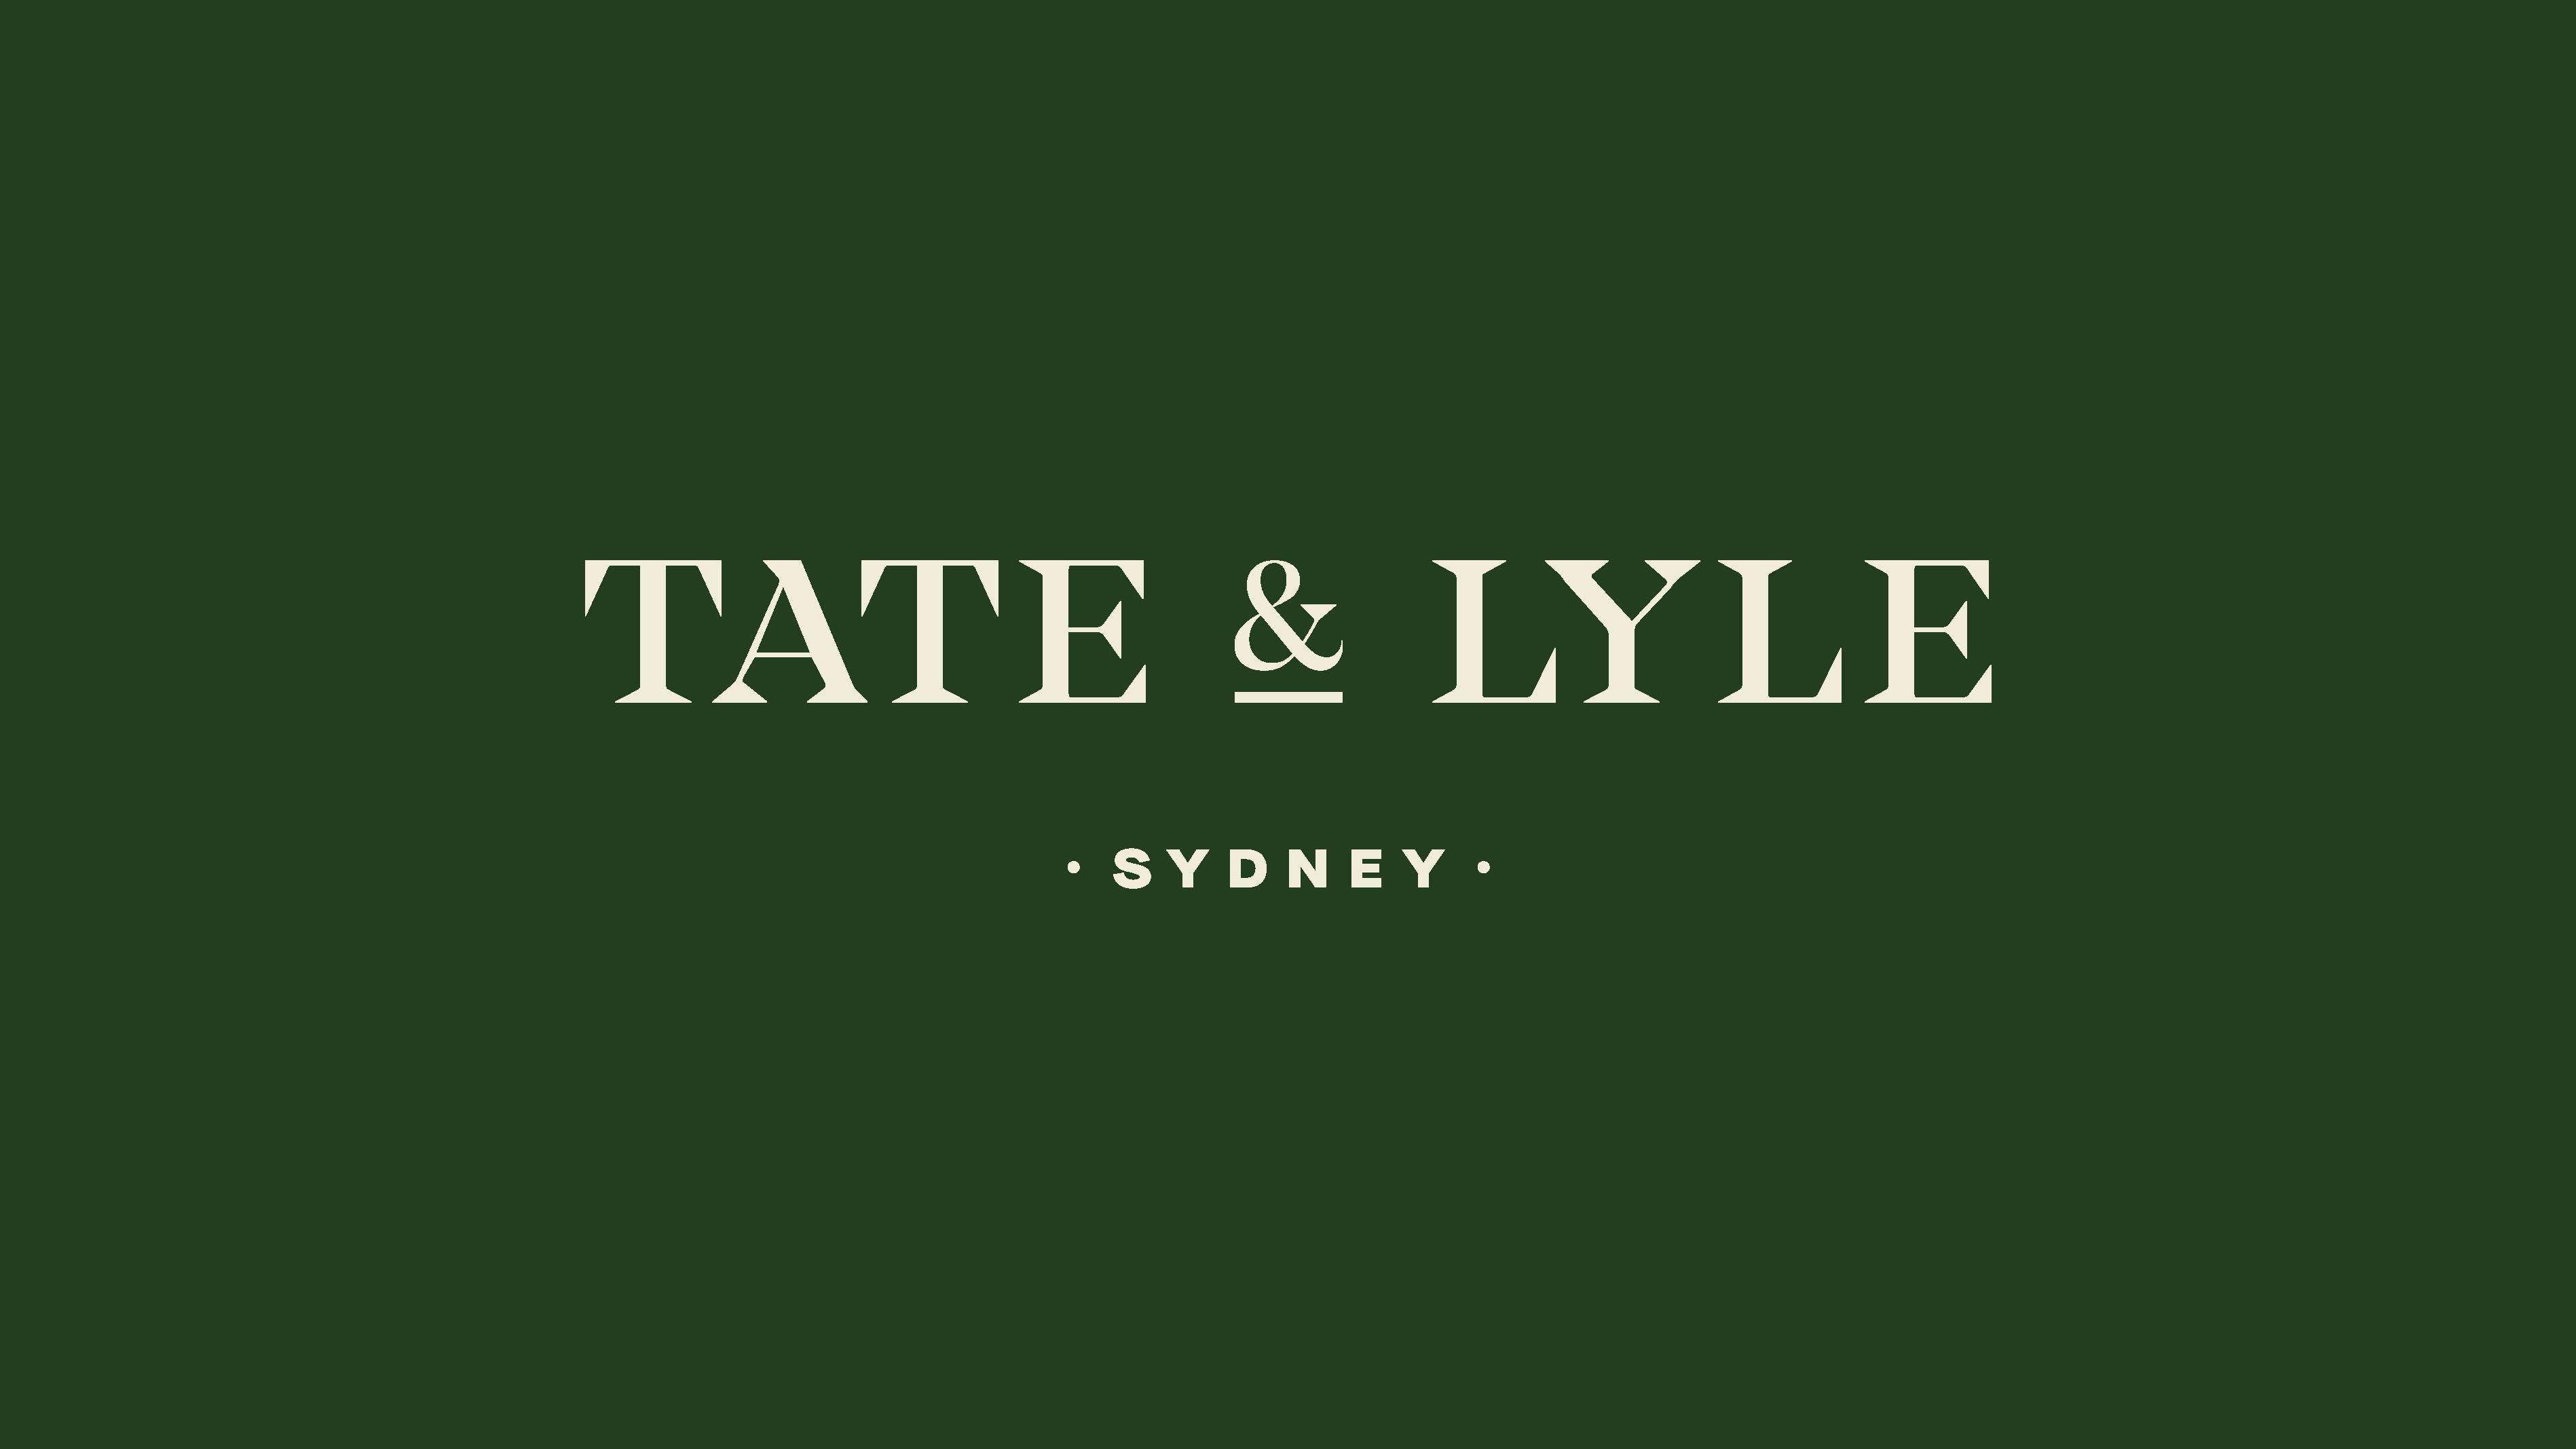 Tate & Lyle®